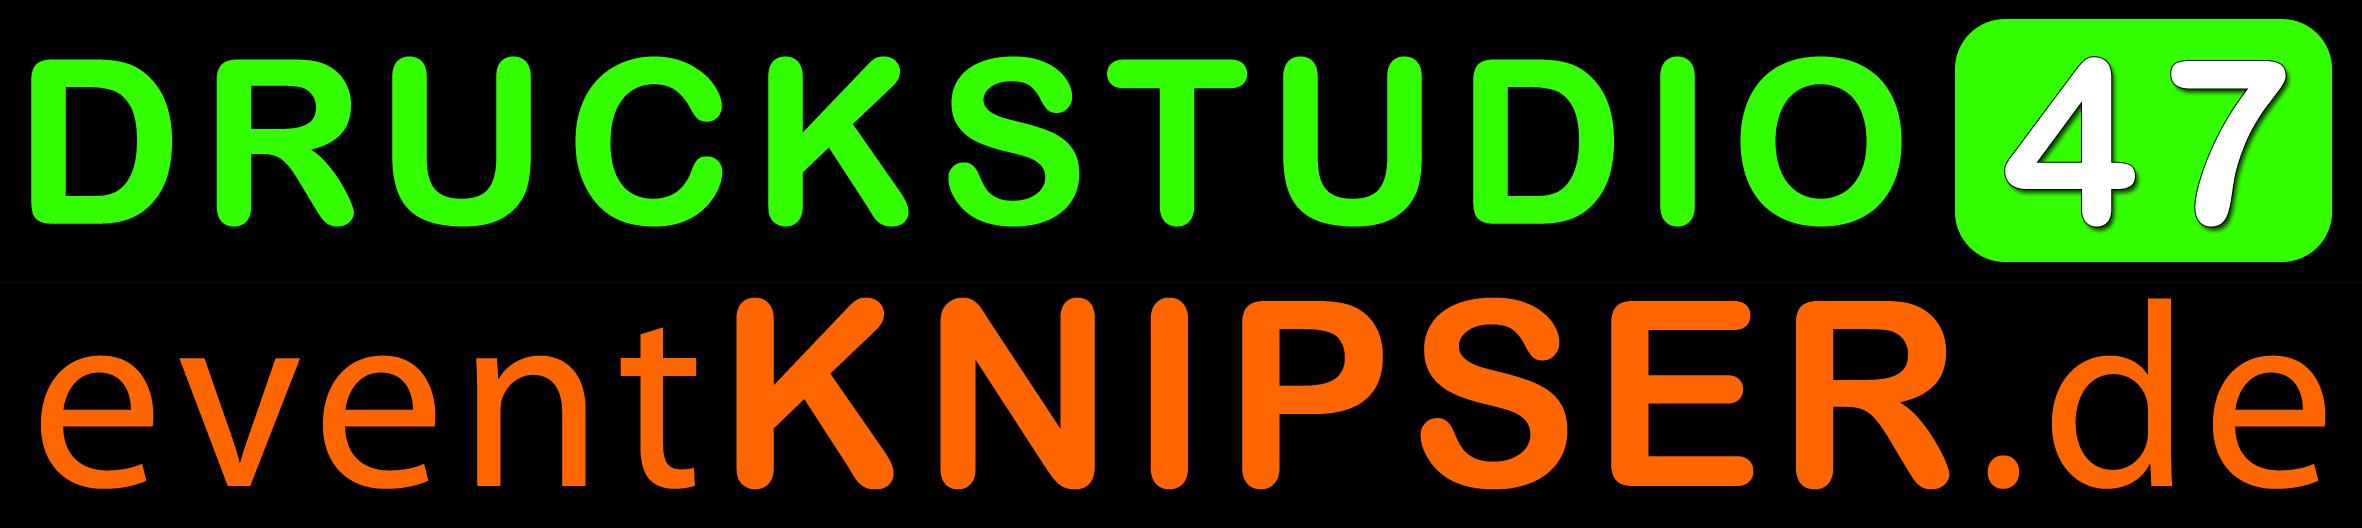 Logo-Druckstudio47+eventKNIPSER